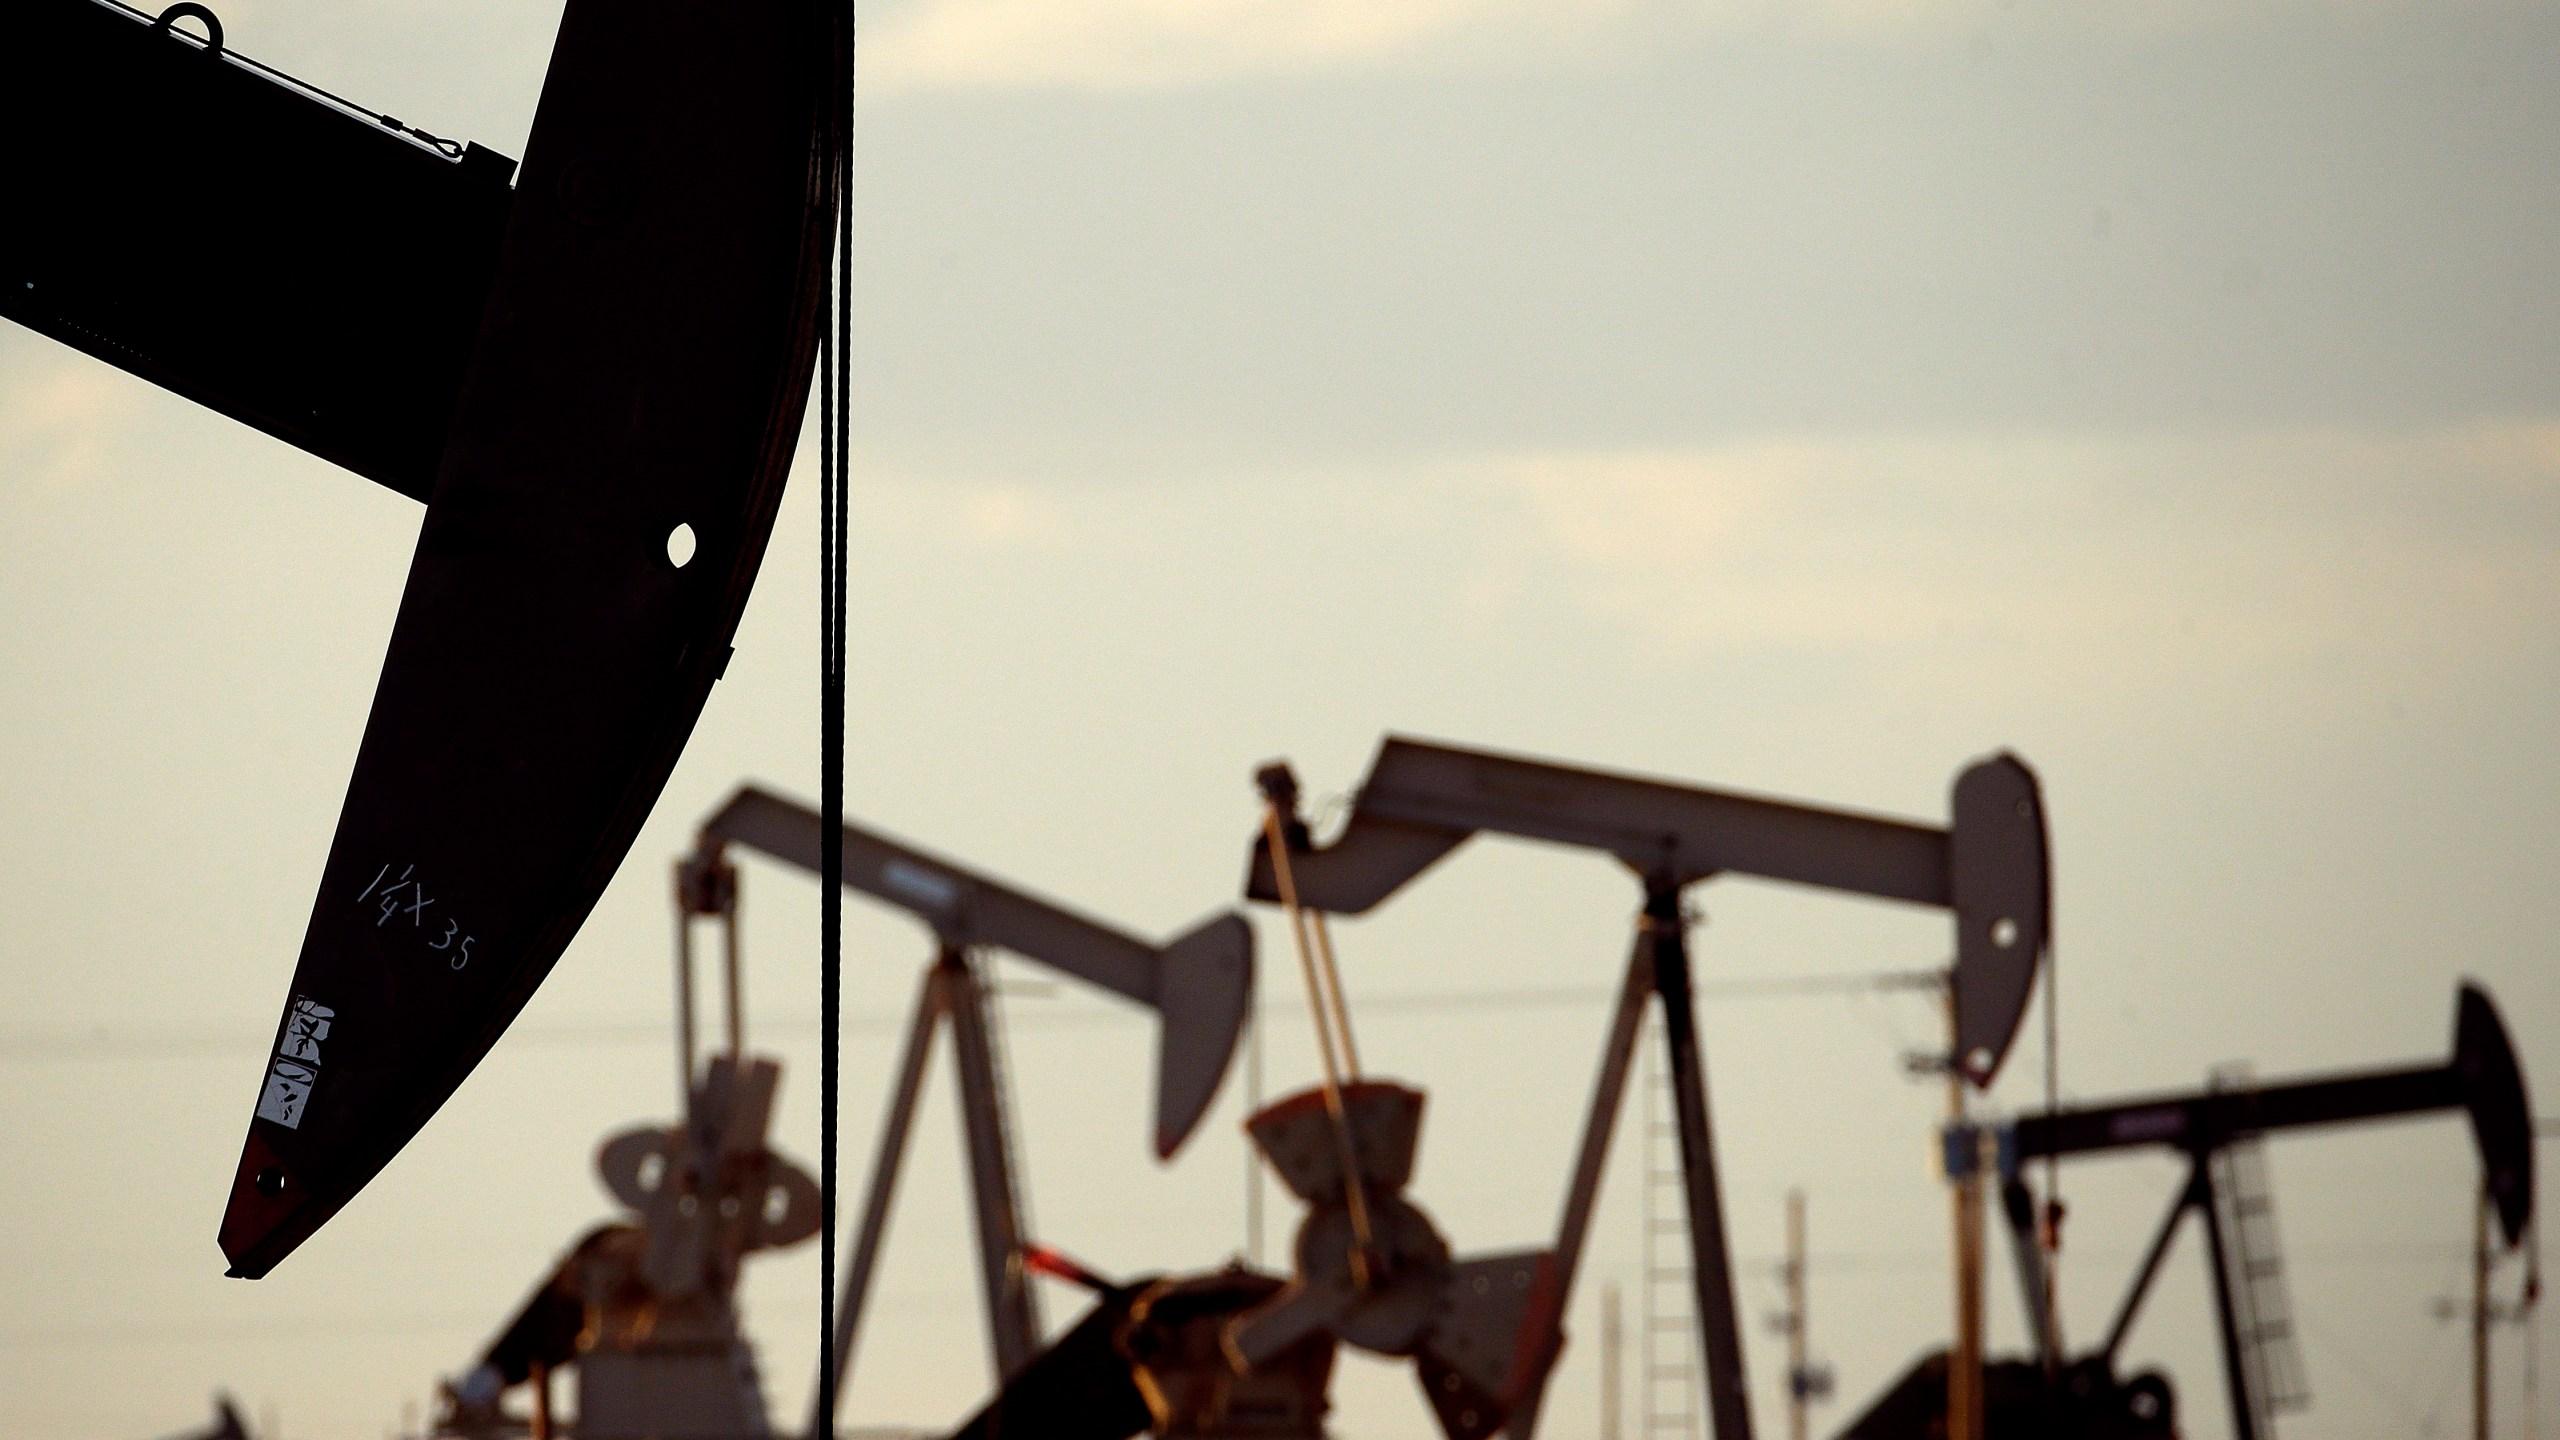 Oil_Production_US_83314-159532.jpg99468387